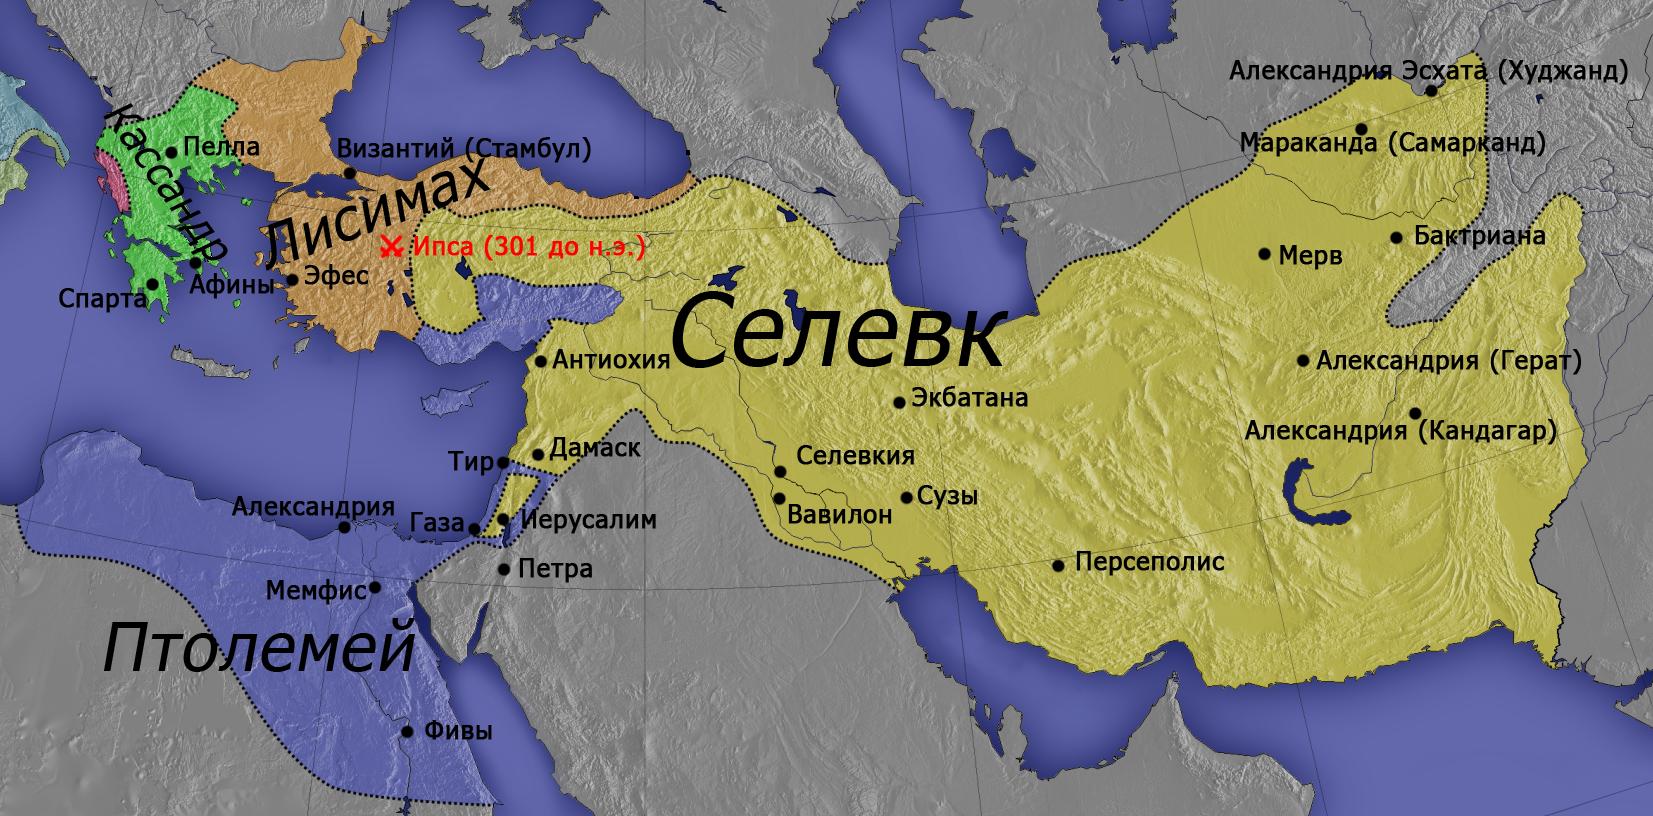 Hellenistic_world_300BC_ru.png